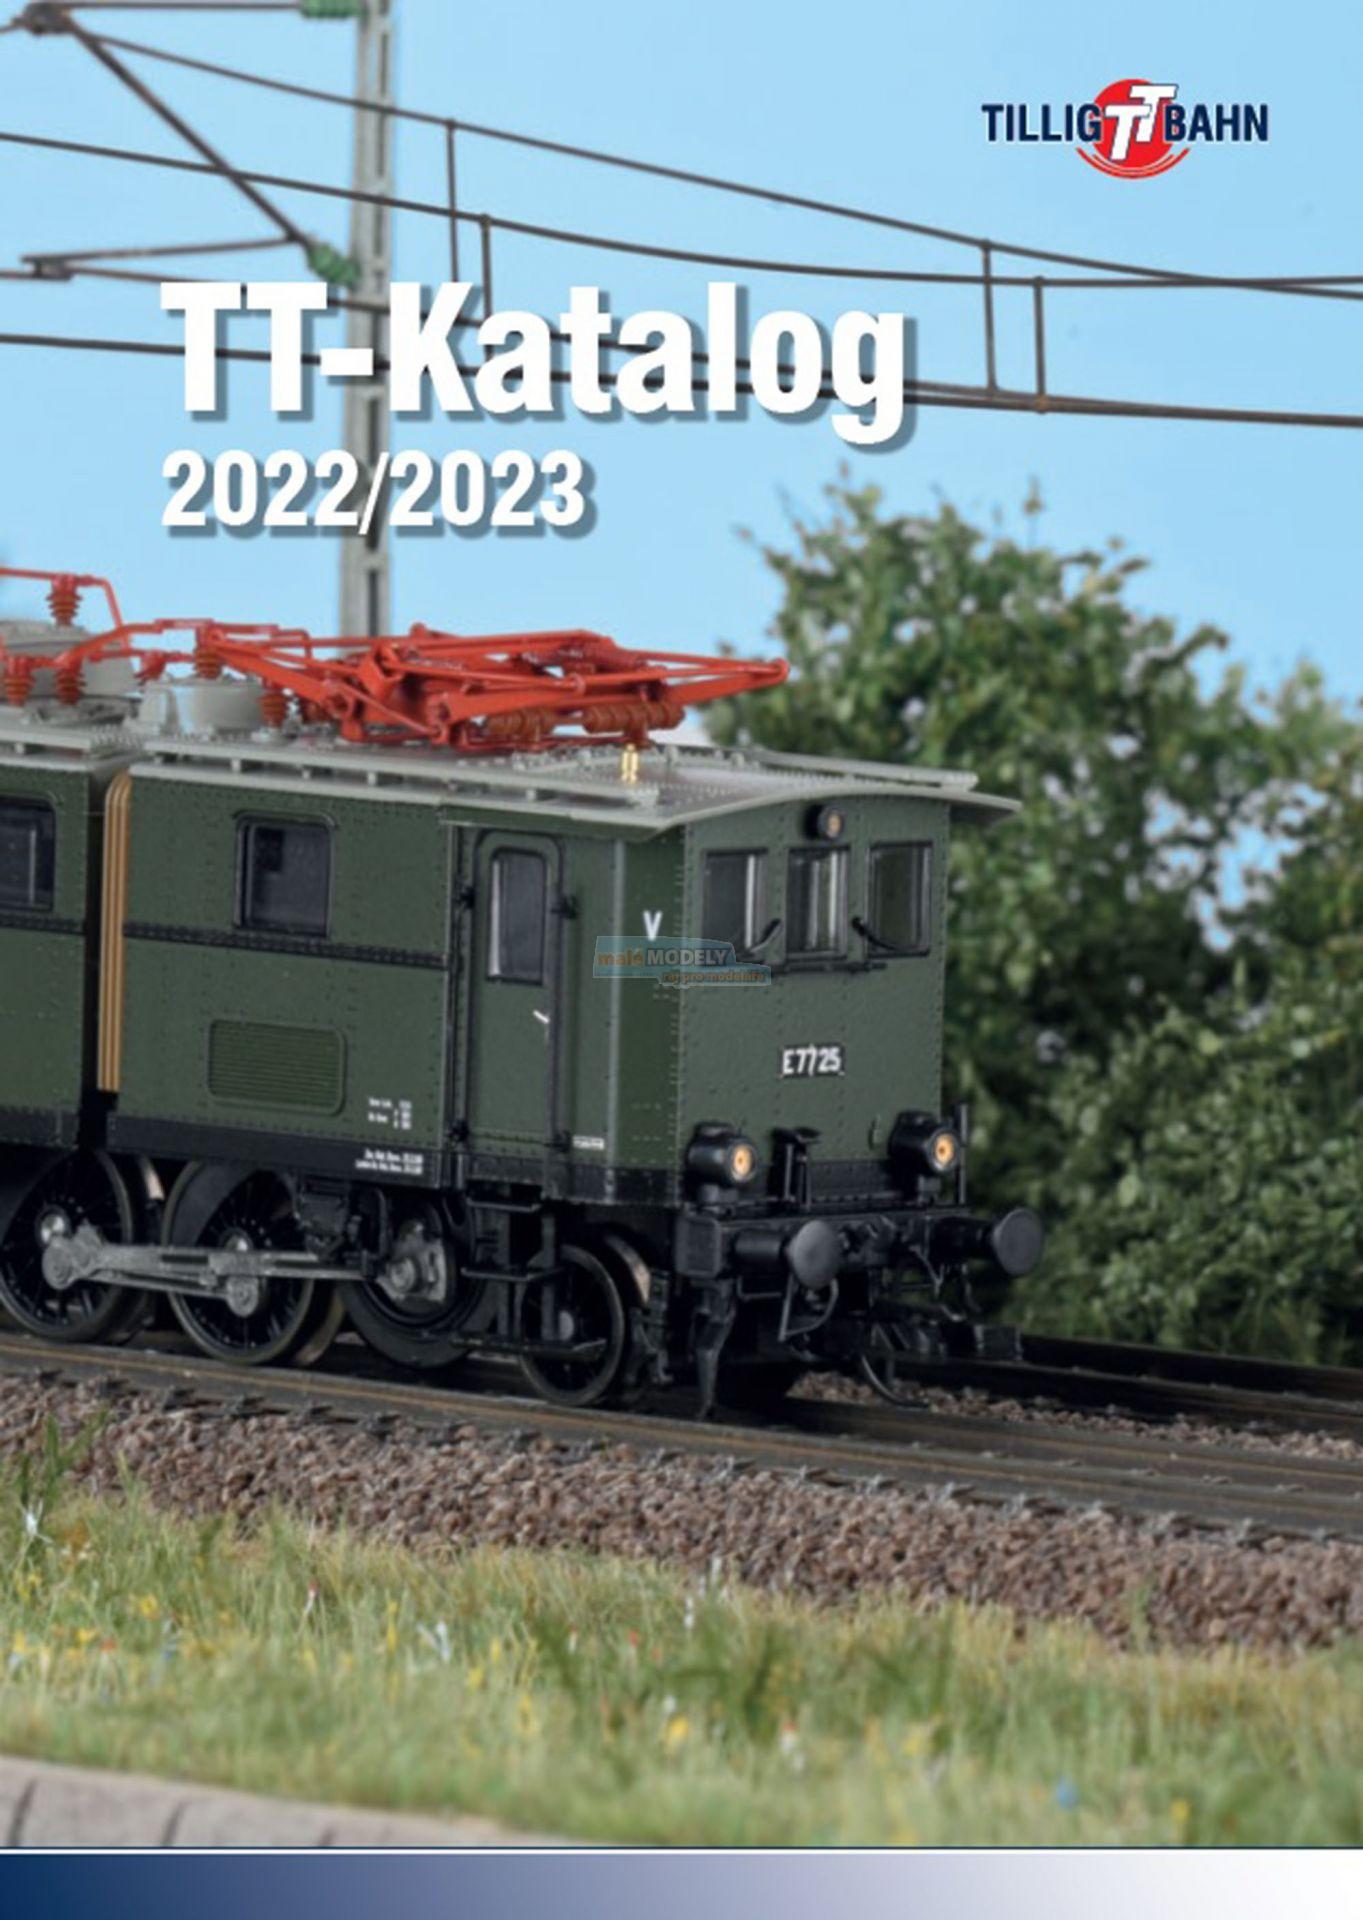 Katalog TT 2012/13